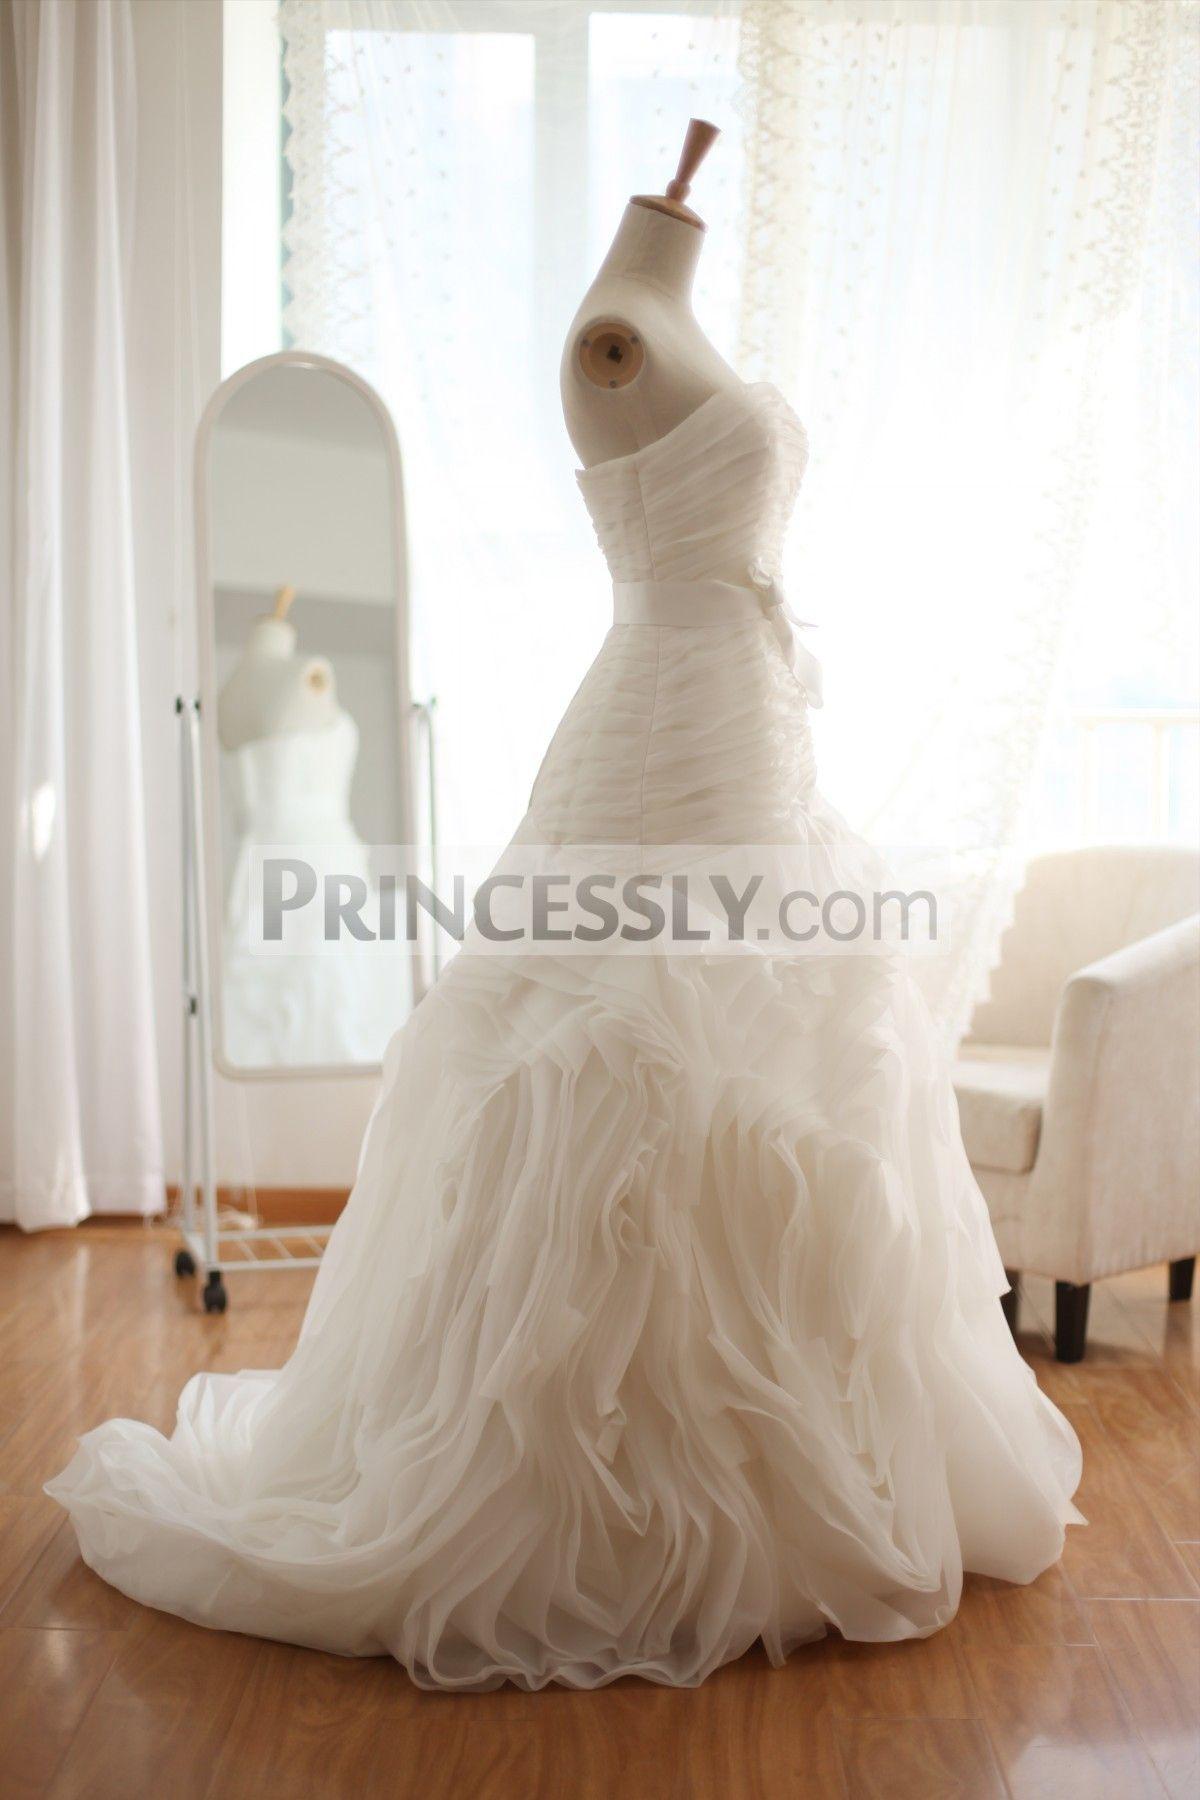 Casamento 2019 Sparkle Crystal Mermaid Wedding Dresses Lush Bottom Ruffles Brida Sparkle Wedding Dress Wedding Gowns Mermaid Mermaid Wedding Dress With Sleeves [ 1000 x 1000 Pixel ]